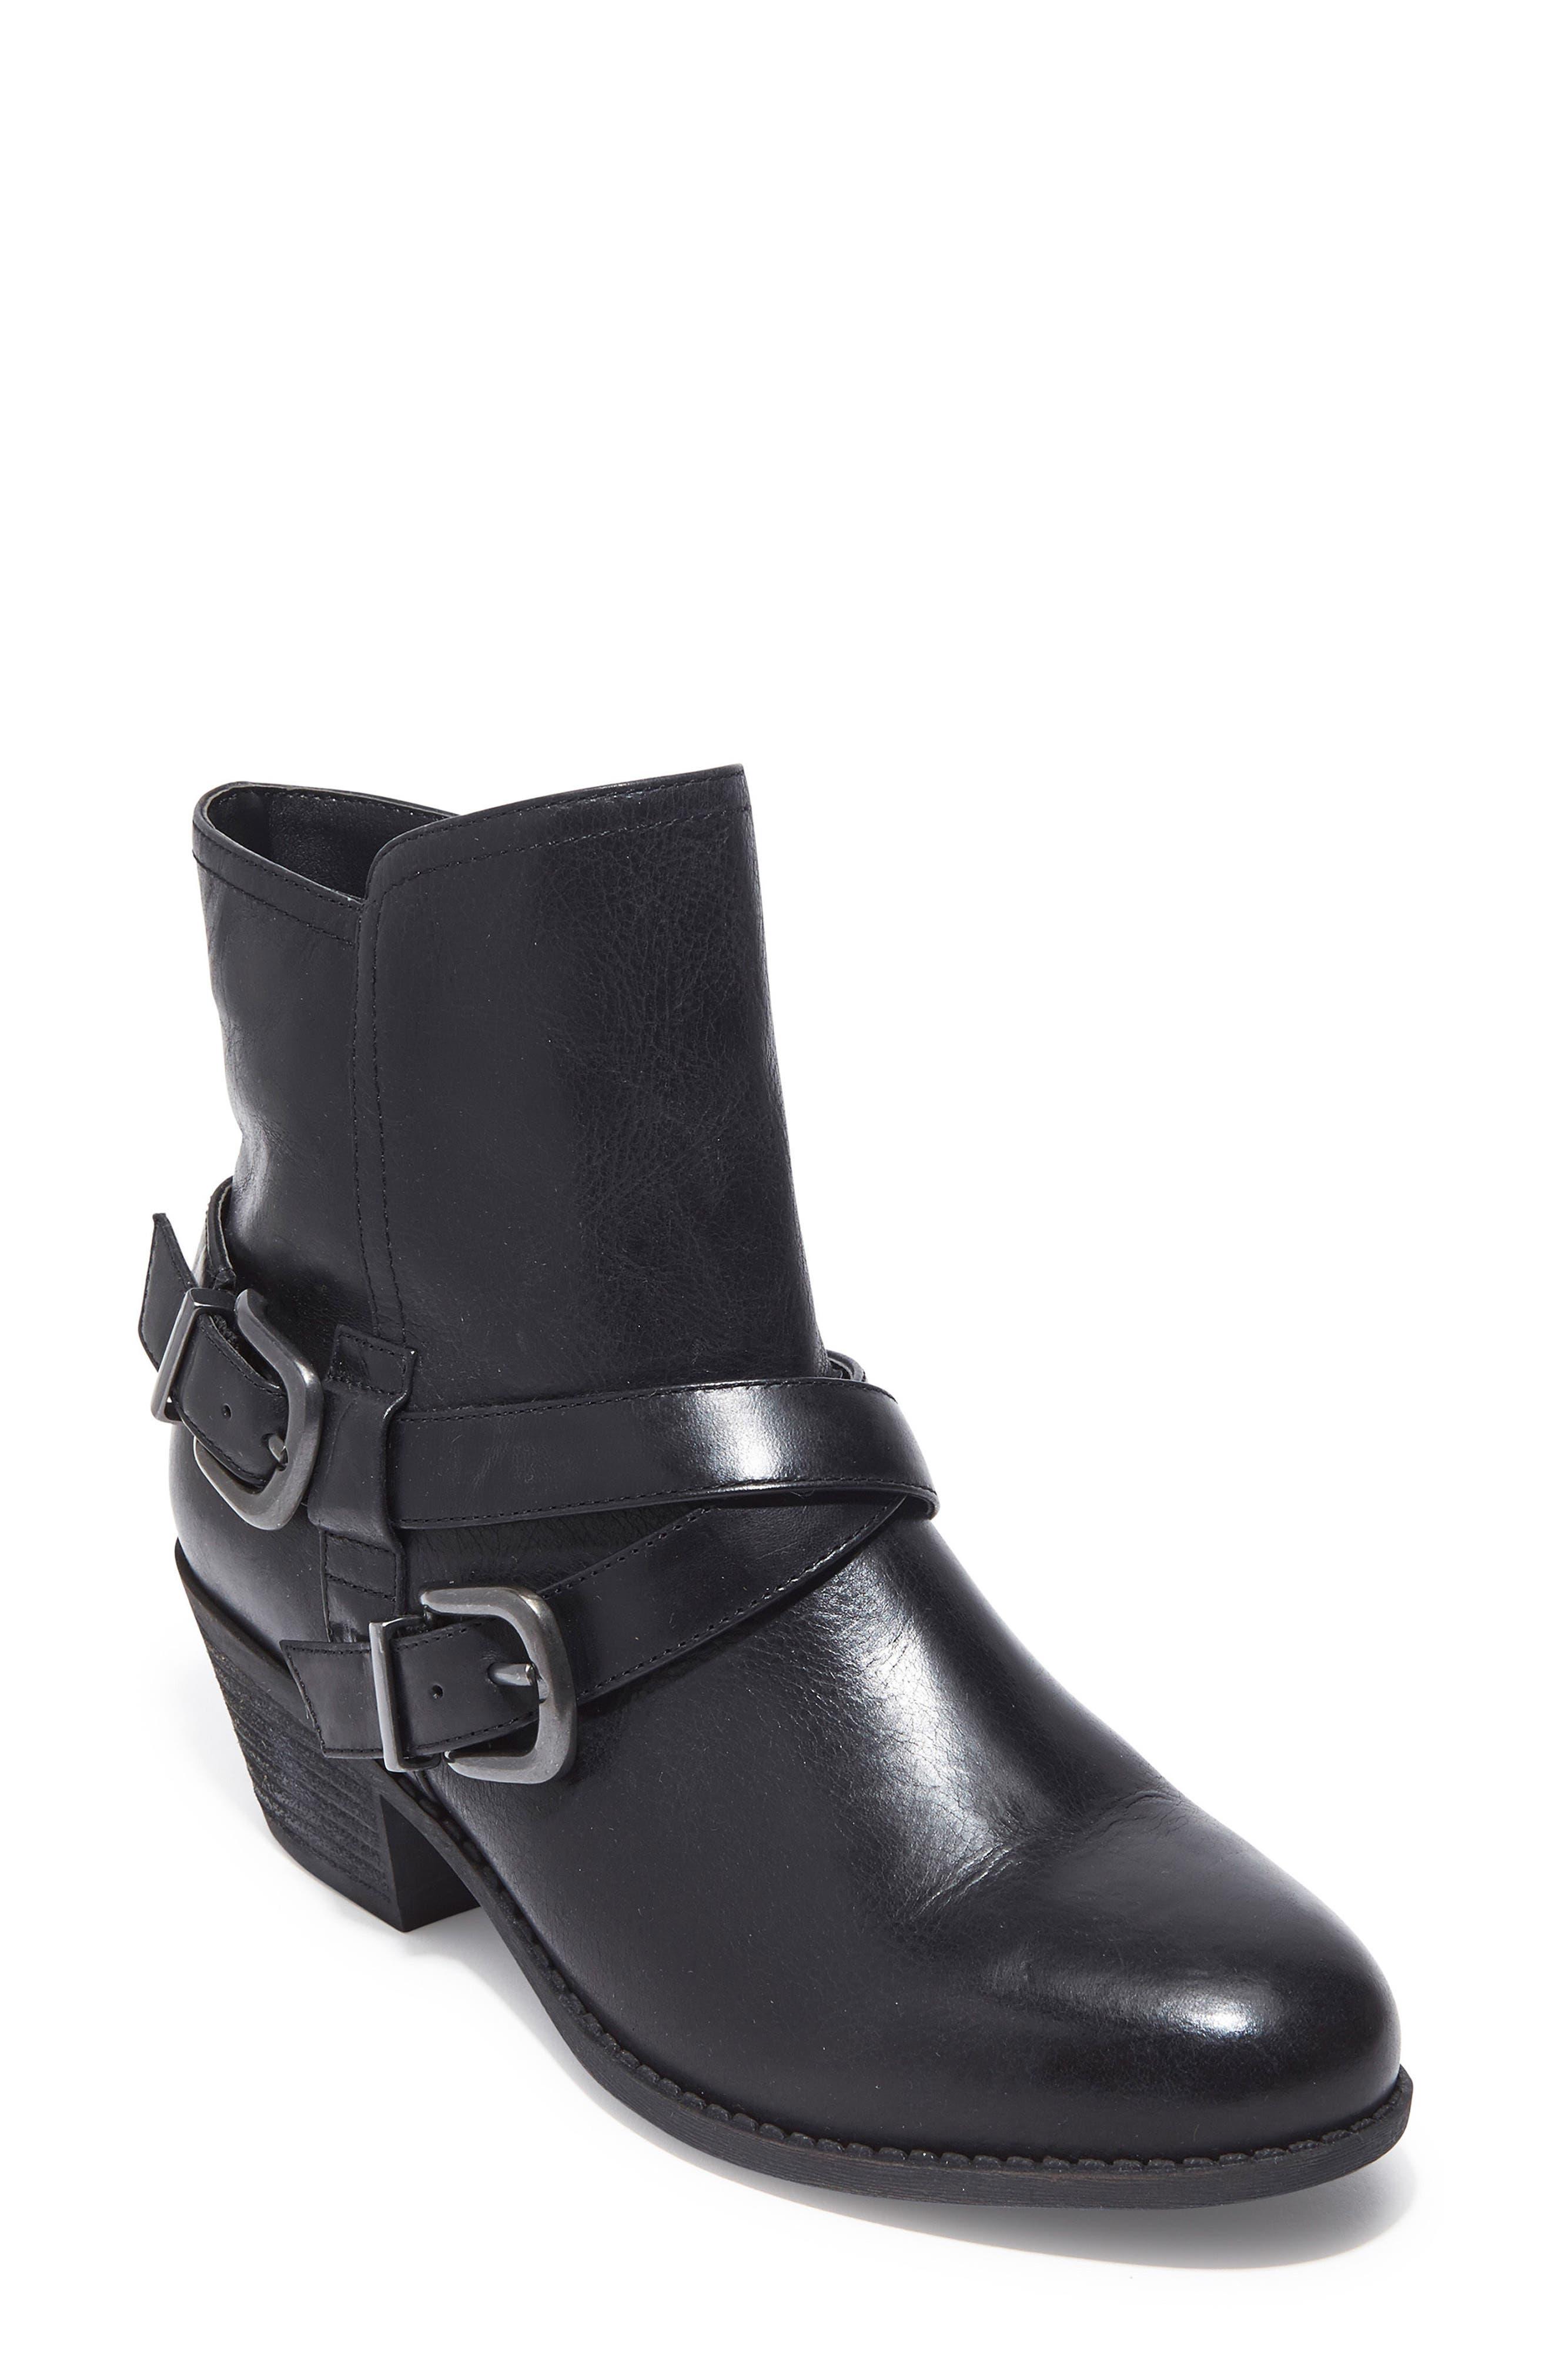 Main Image - Me Too Zuri Buckle Boot (Women)